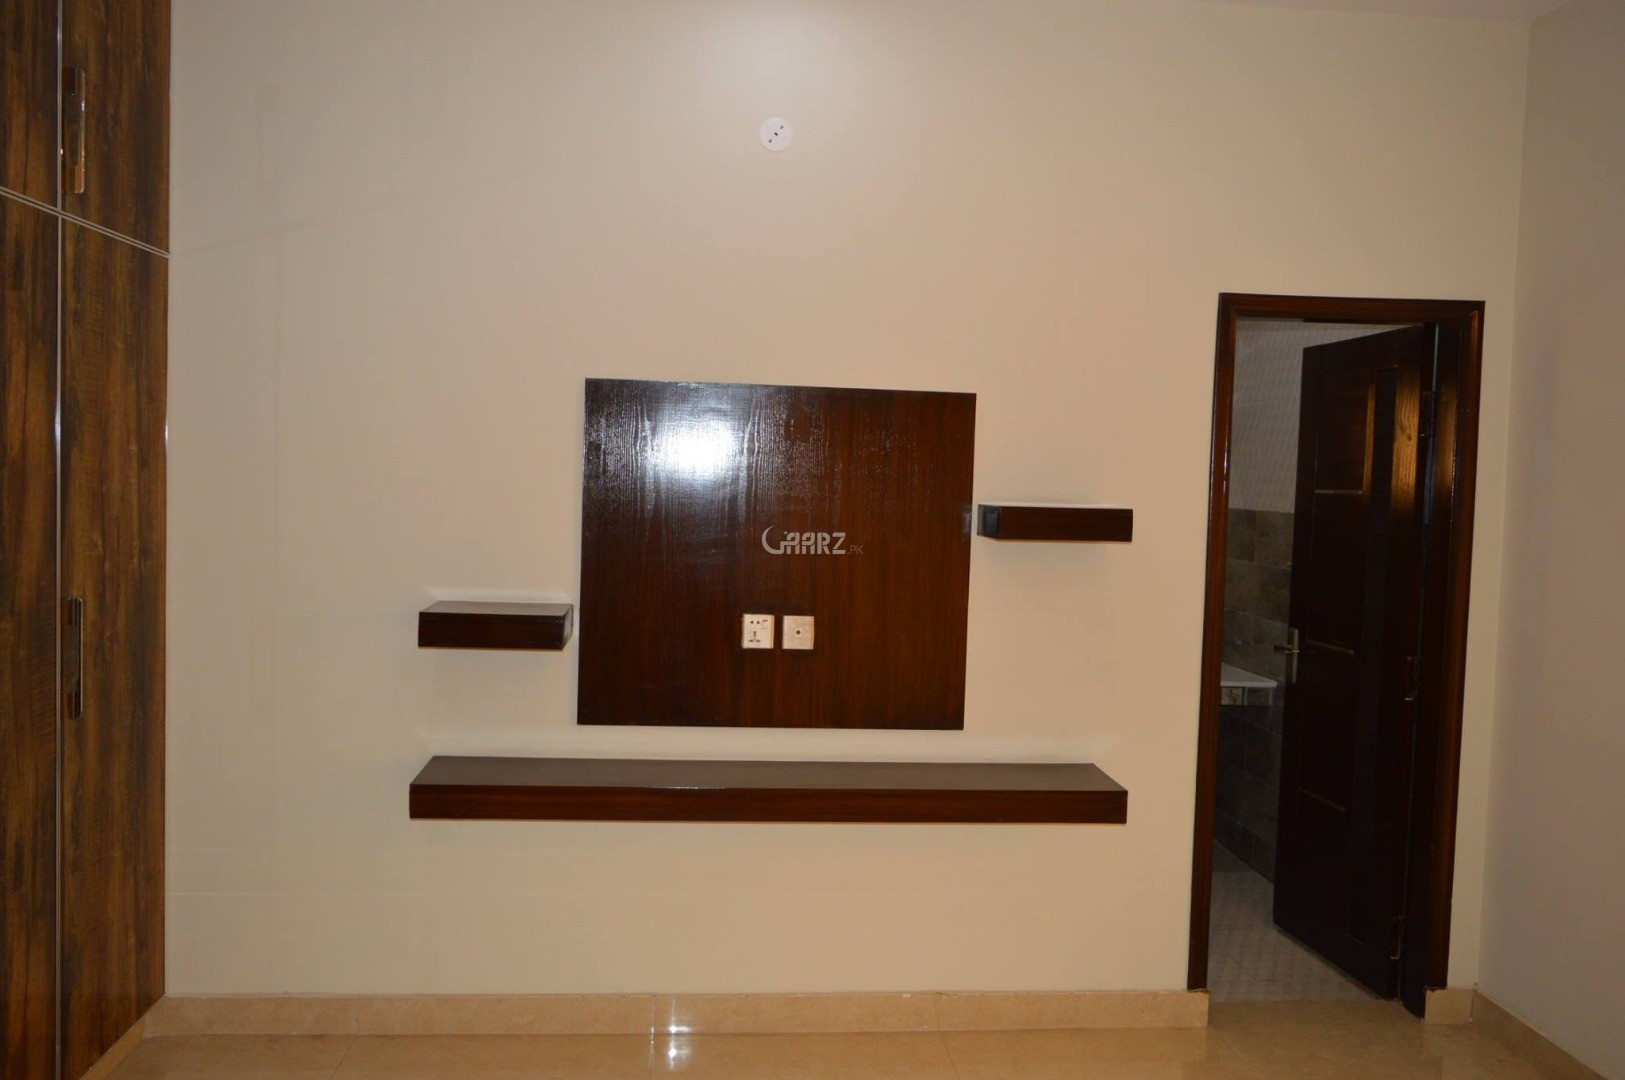 400 Square Feet Apartment for Rent in Karachi Gulistan-e-jauhar Block-13, Gulistan-e-jauhar